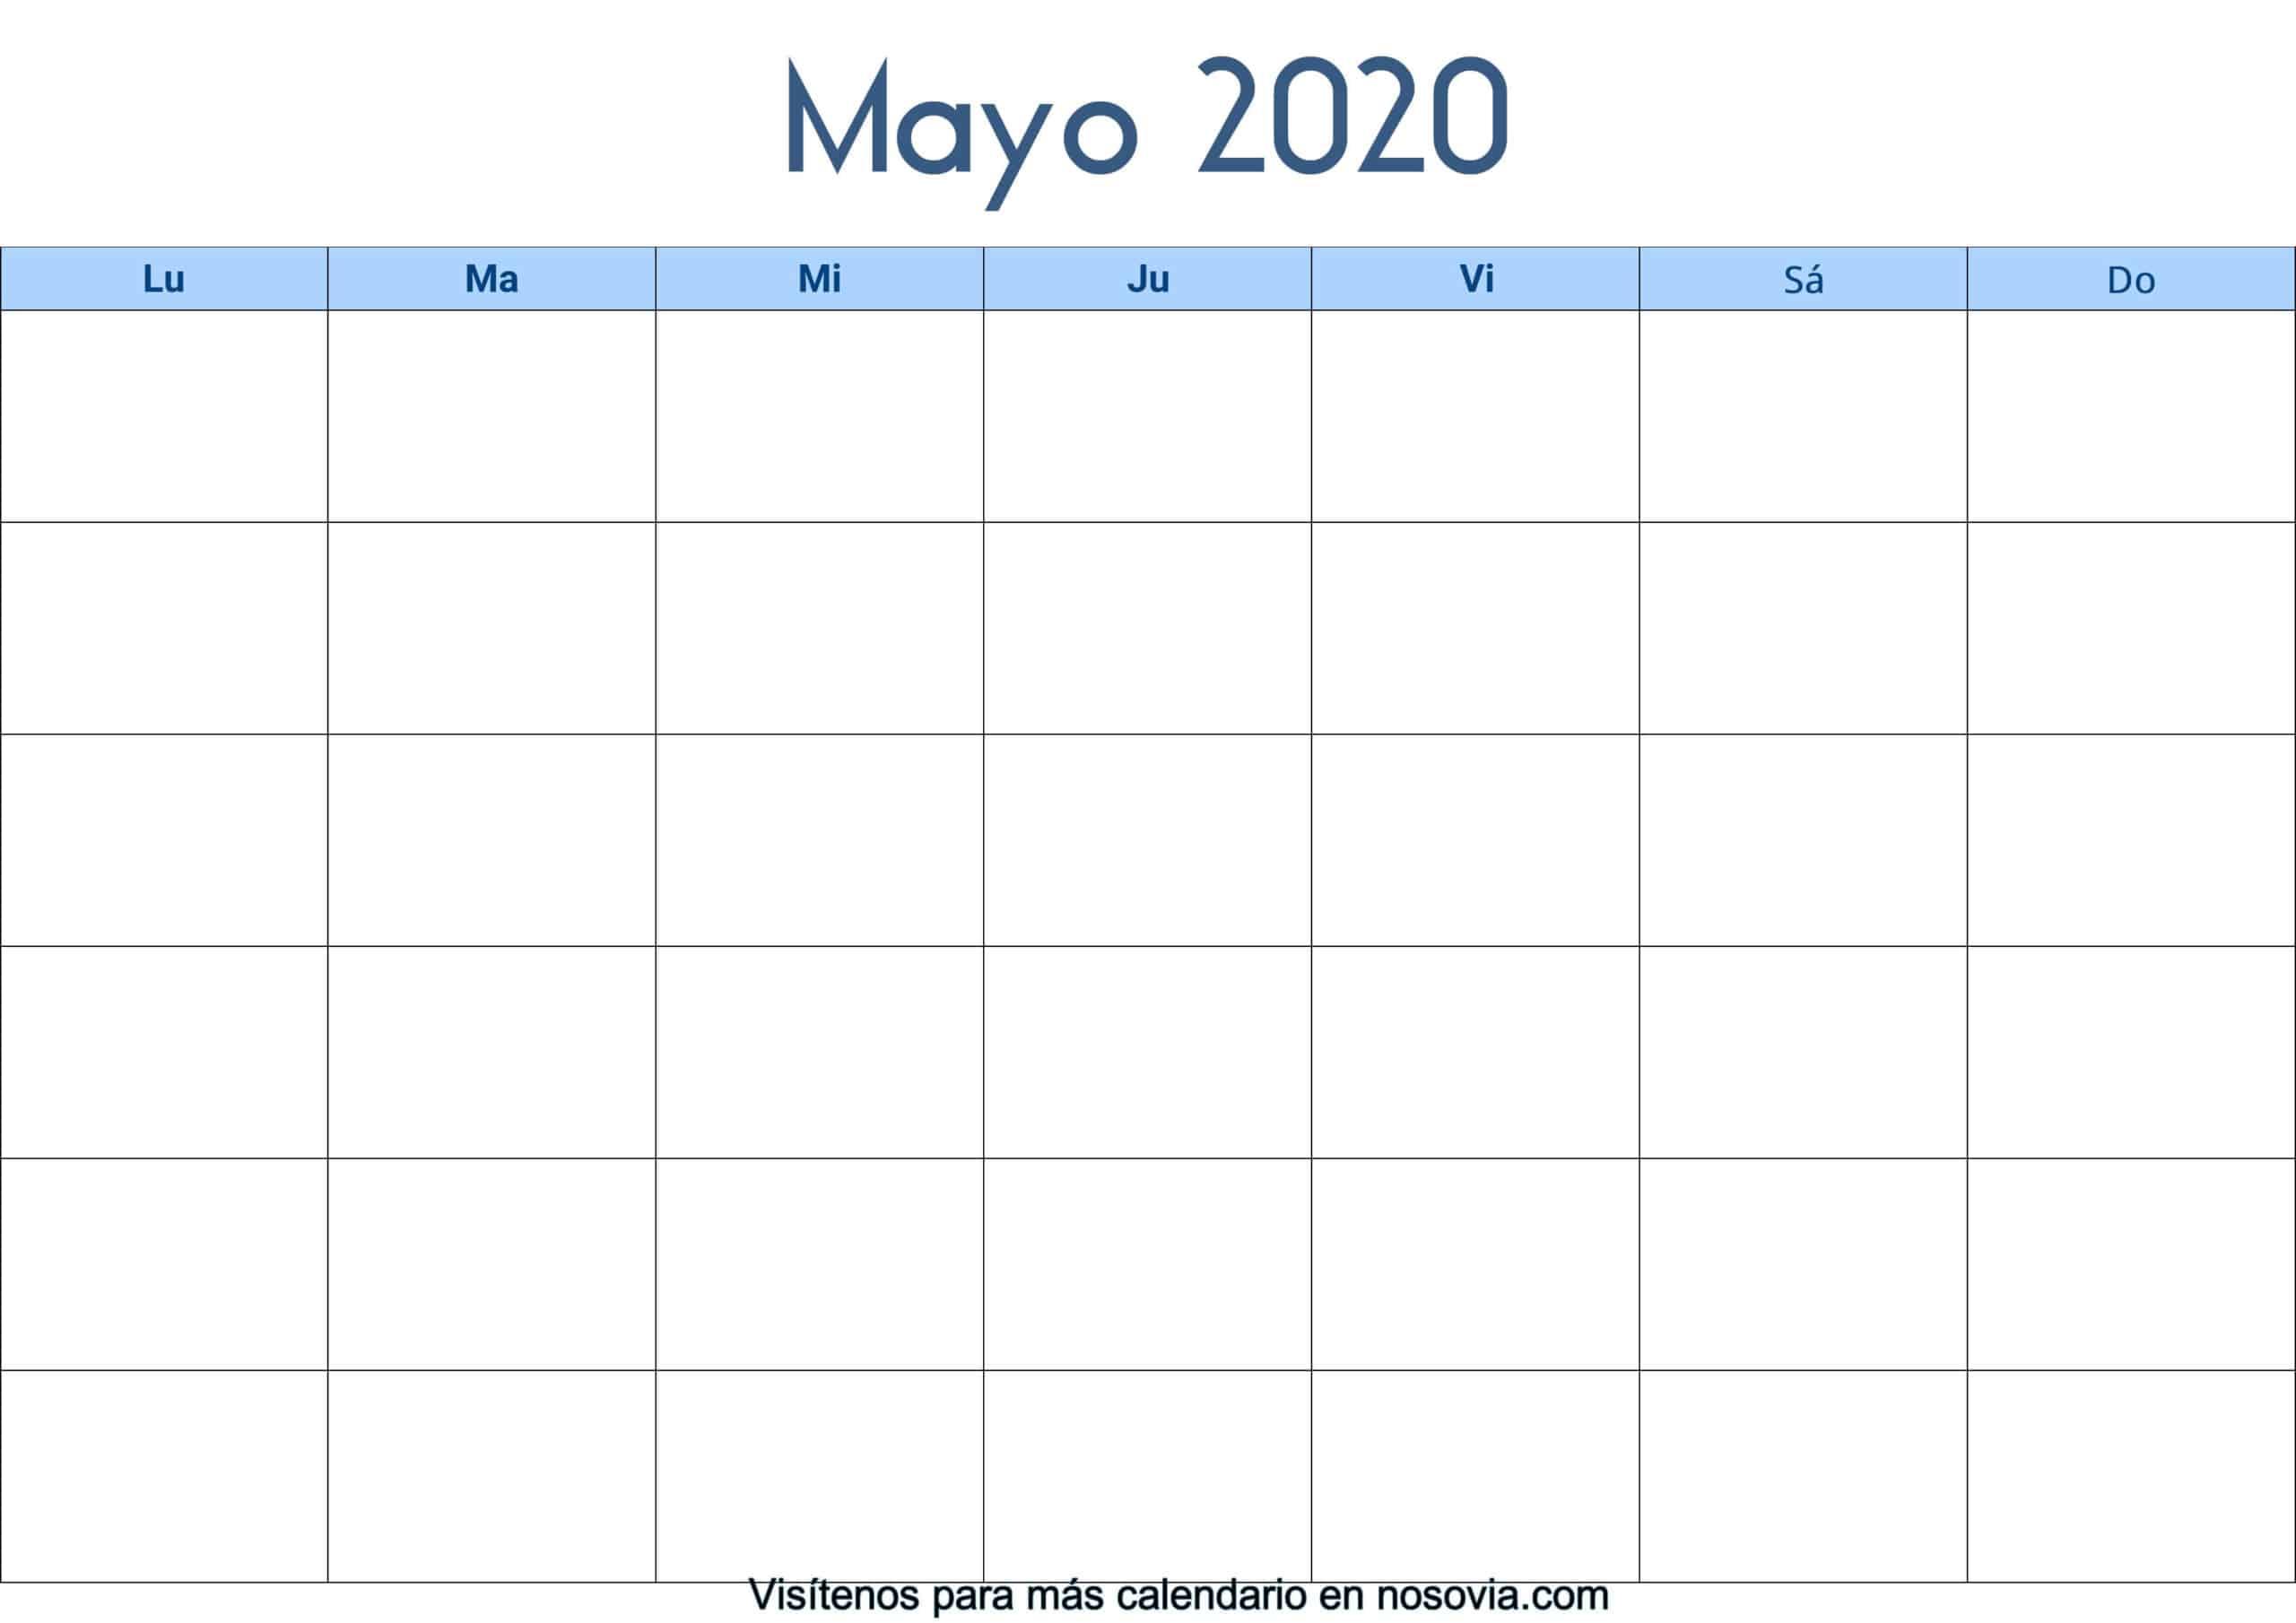 Calendario-mayo-2020-en-blanco-Palabra-gratis